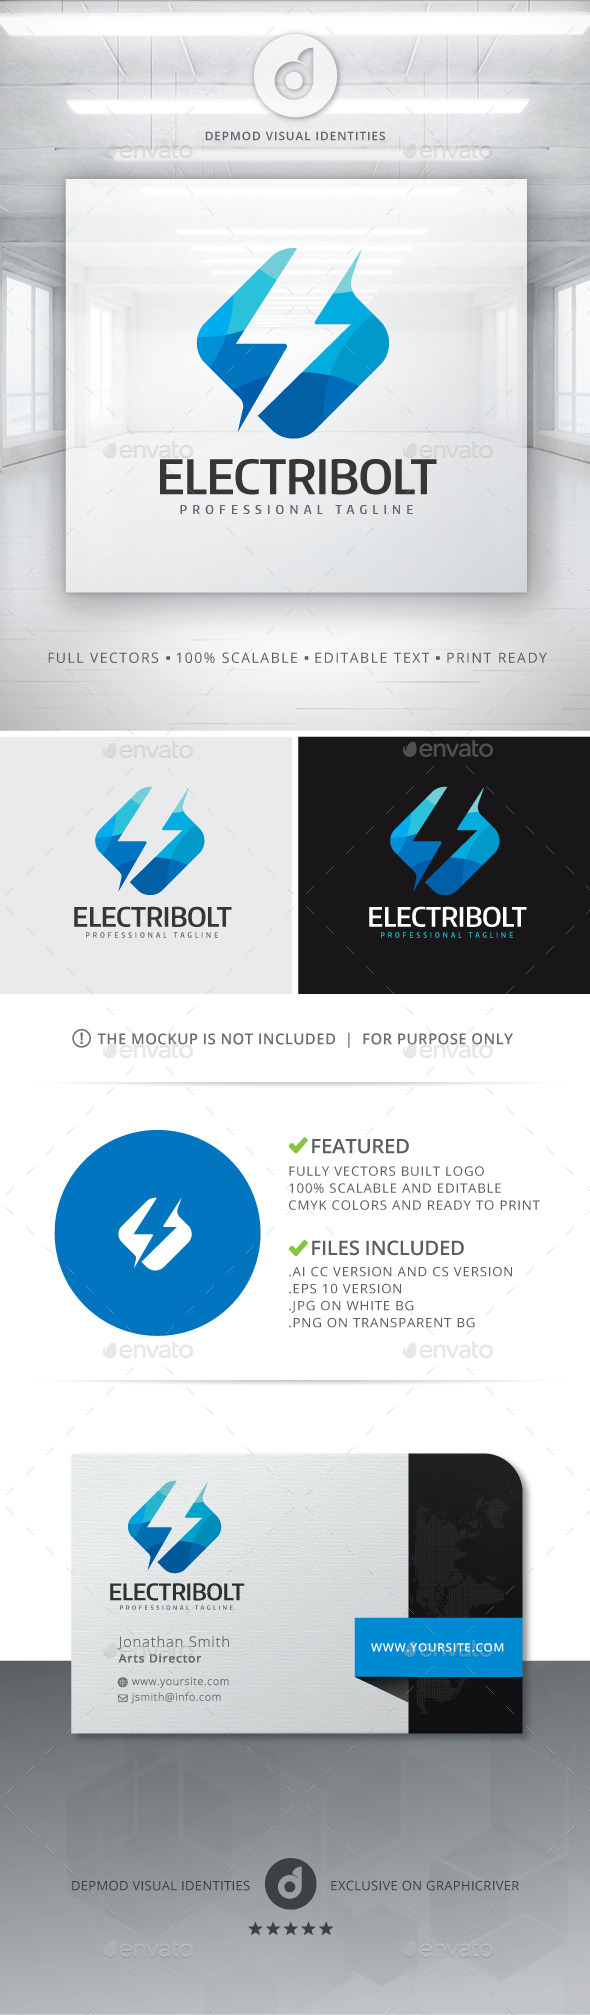 GraphicRiver ElectriBolt Logo 11314643